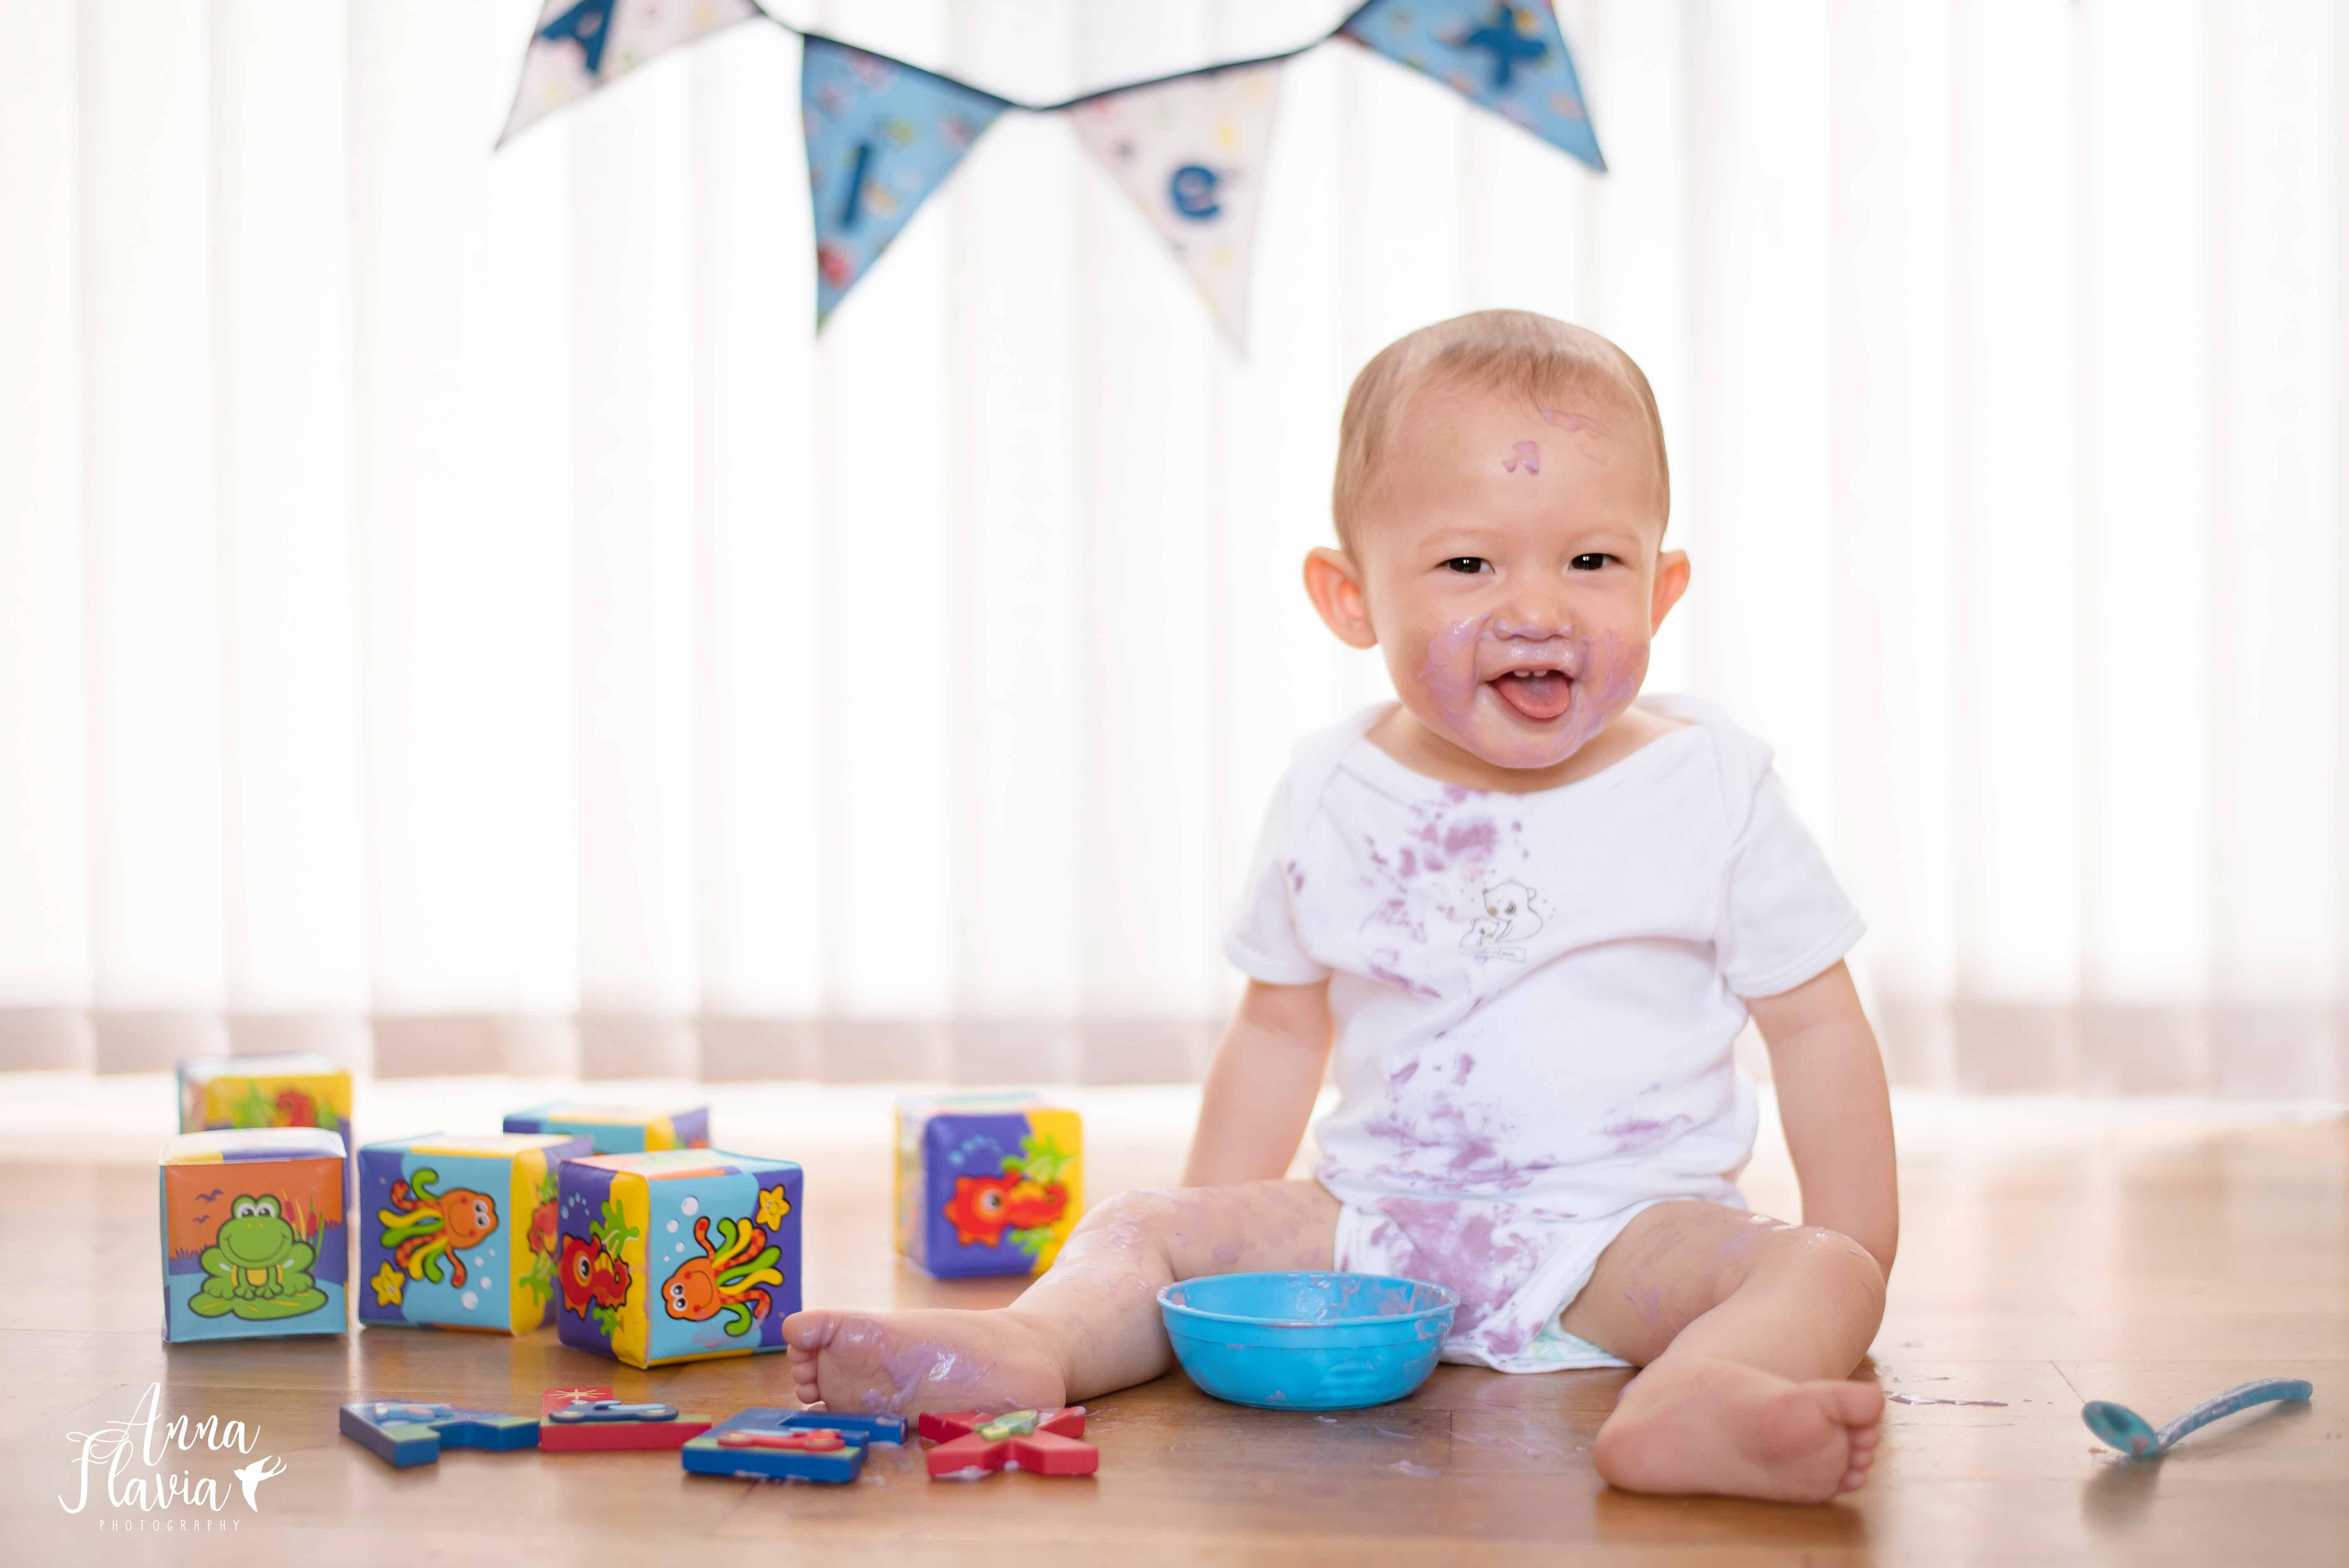 photographer_dublin_anna_flavia_children_baby_newborn_family_5